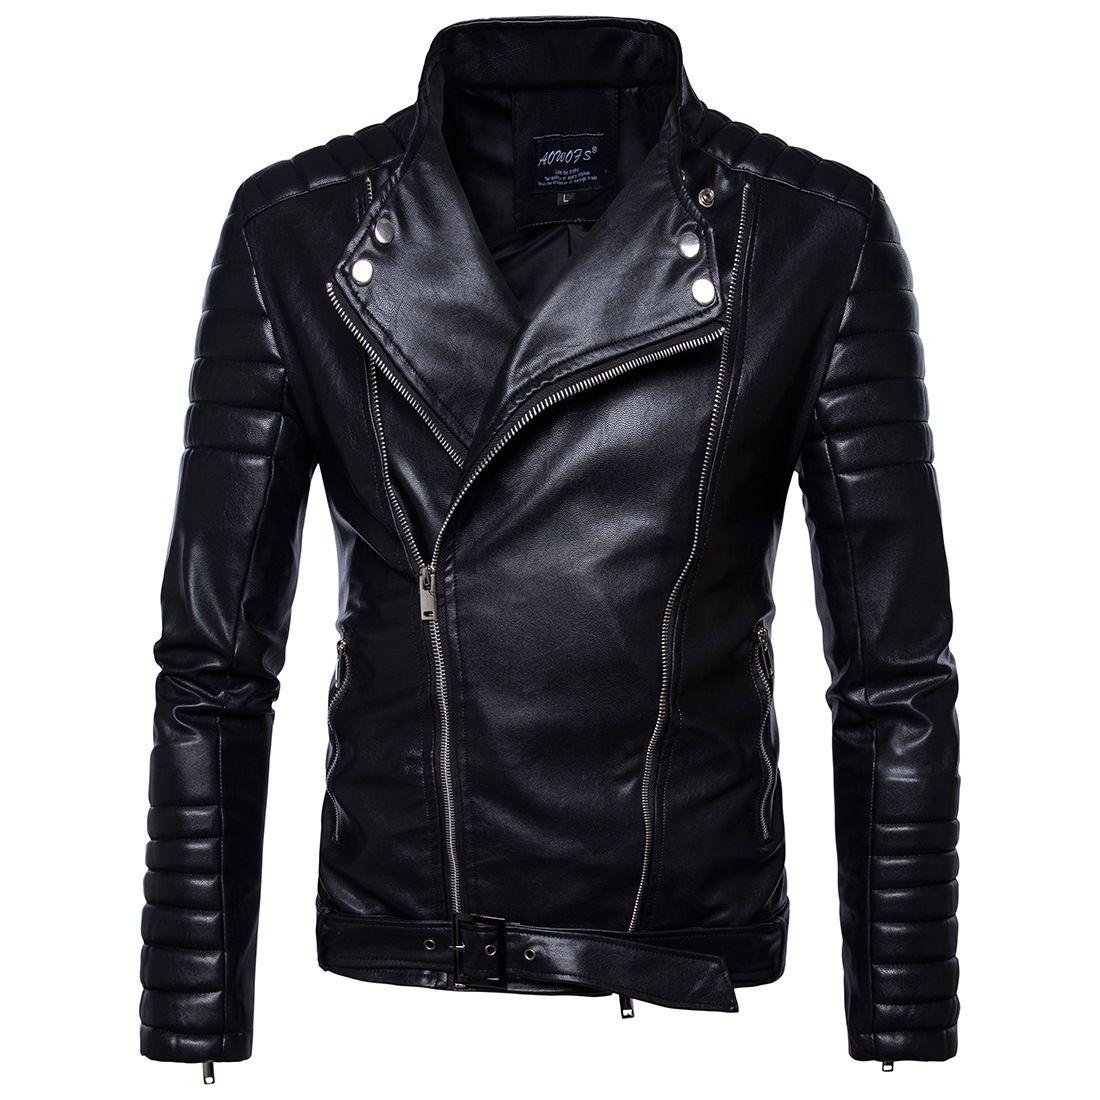 Vintage Jackets Mens Classic Retro Jacket Turn Down Collar Slim Faux Leather Biker Jacket Motorcycle Clothing